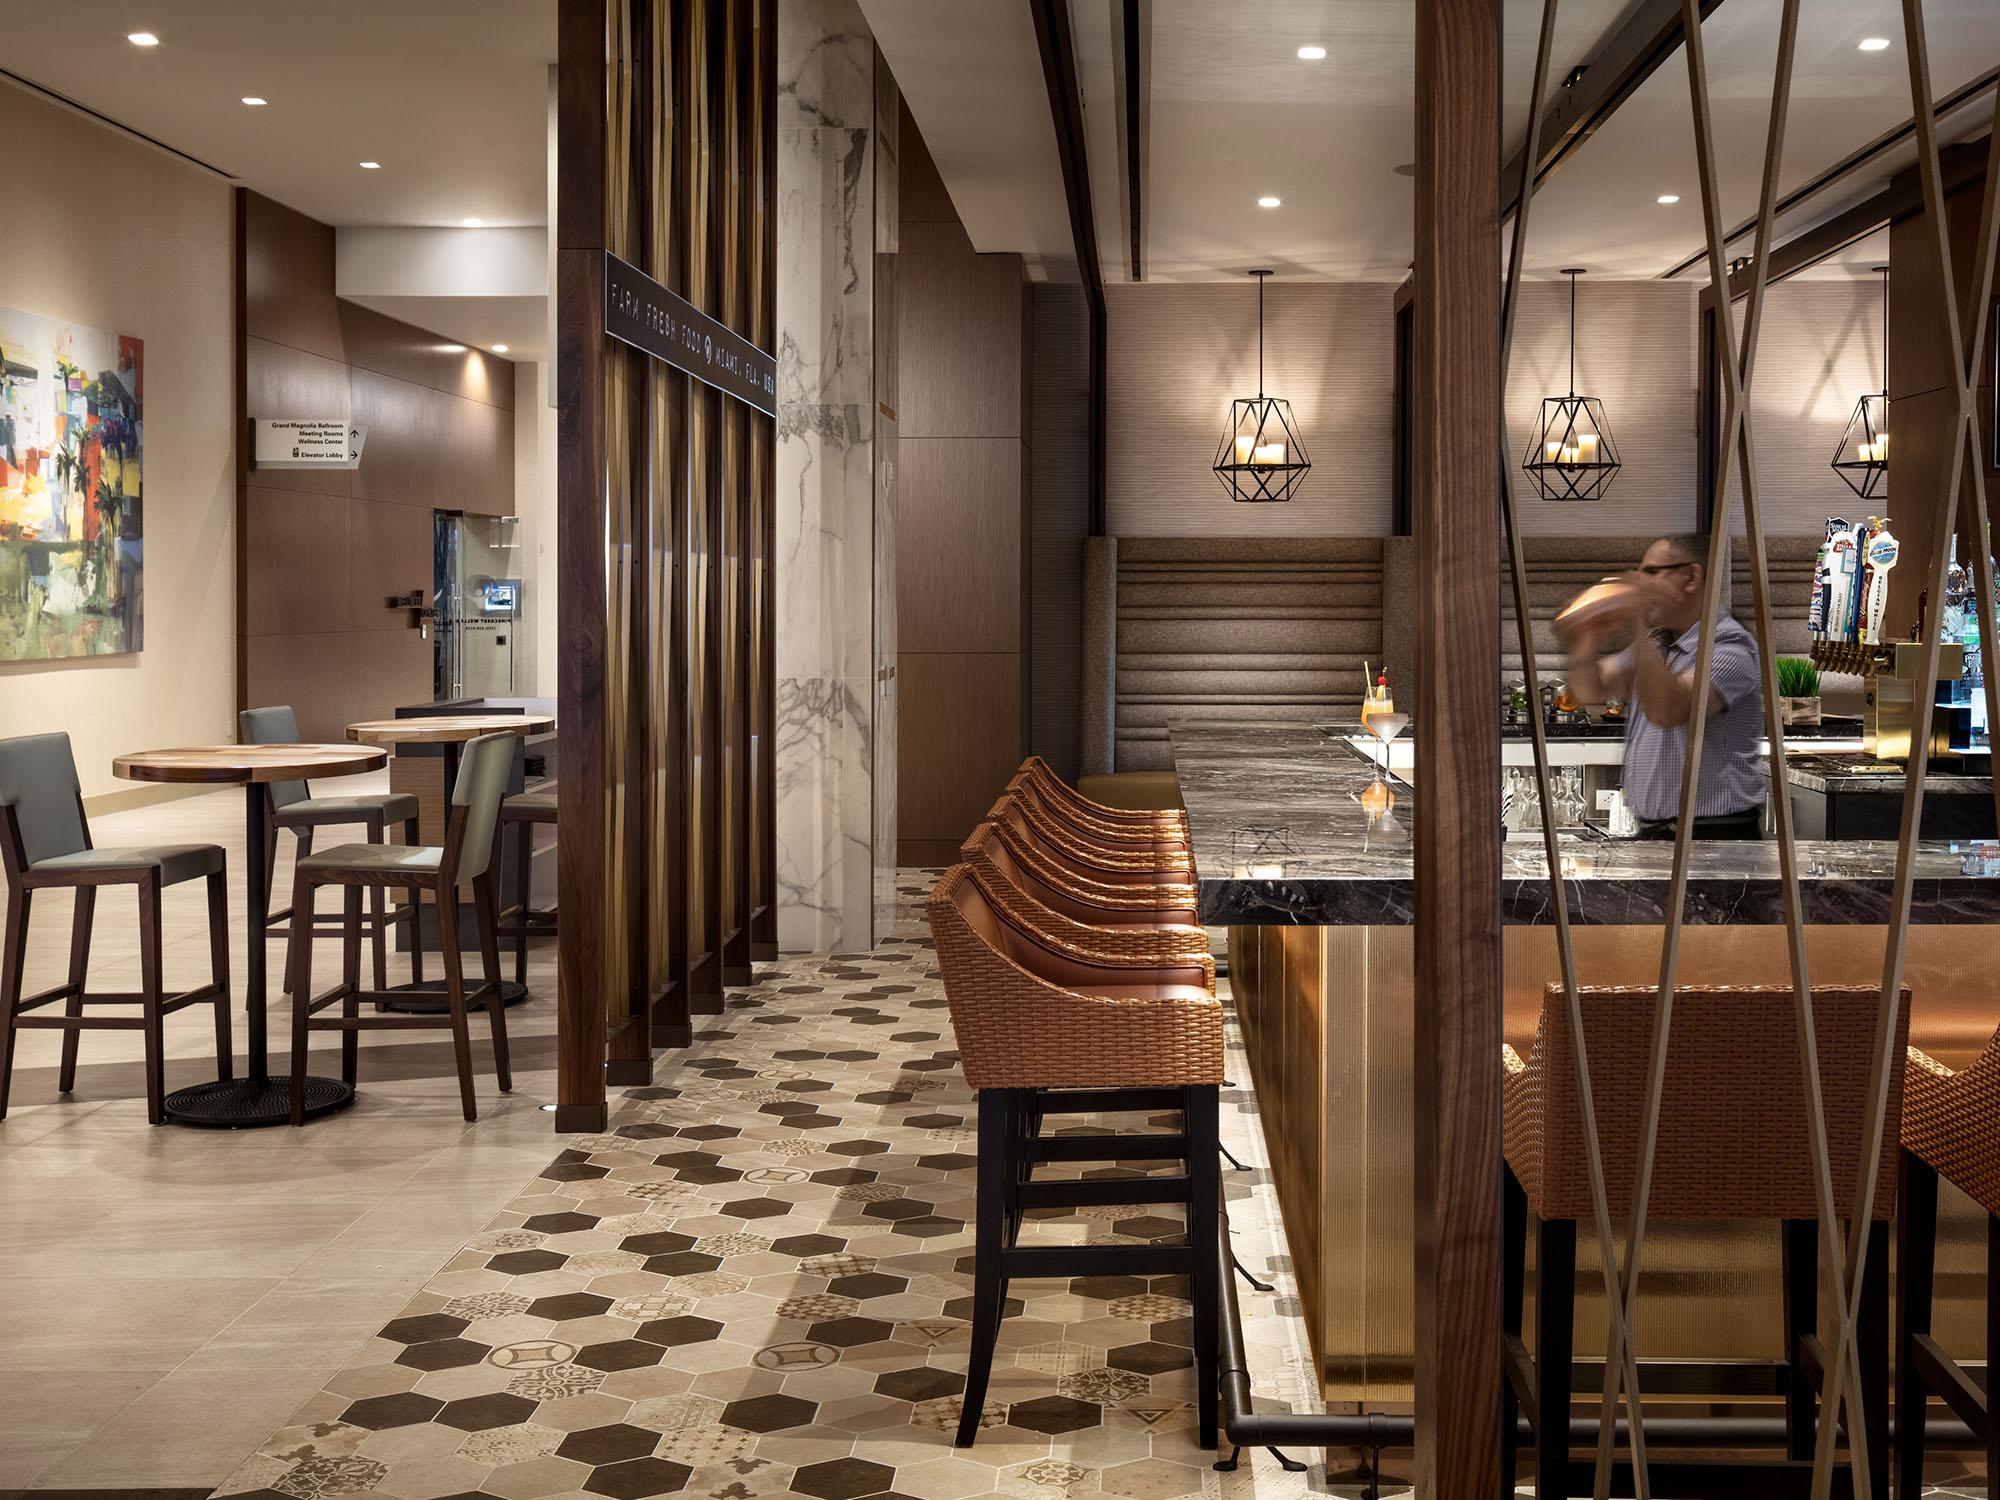 Hilton Miami Dadeland Hospitality Furniture Design _0003_RTKL_050819_9270.jpg